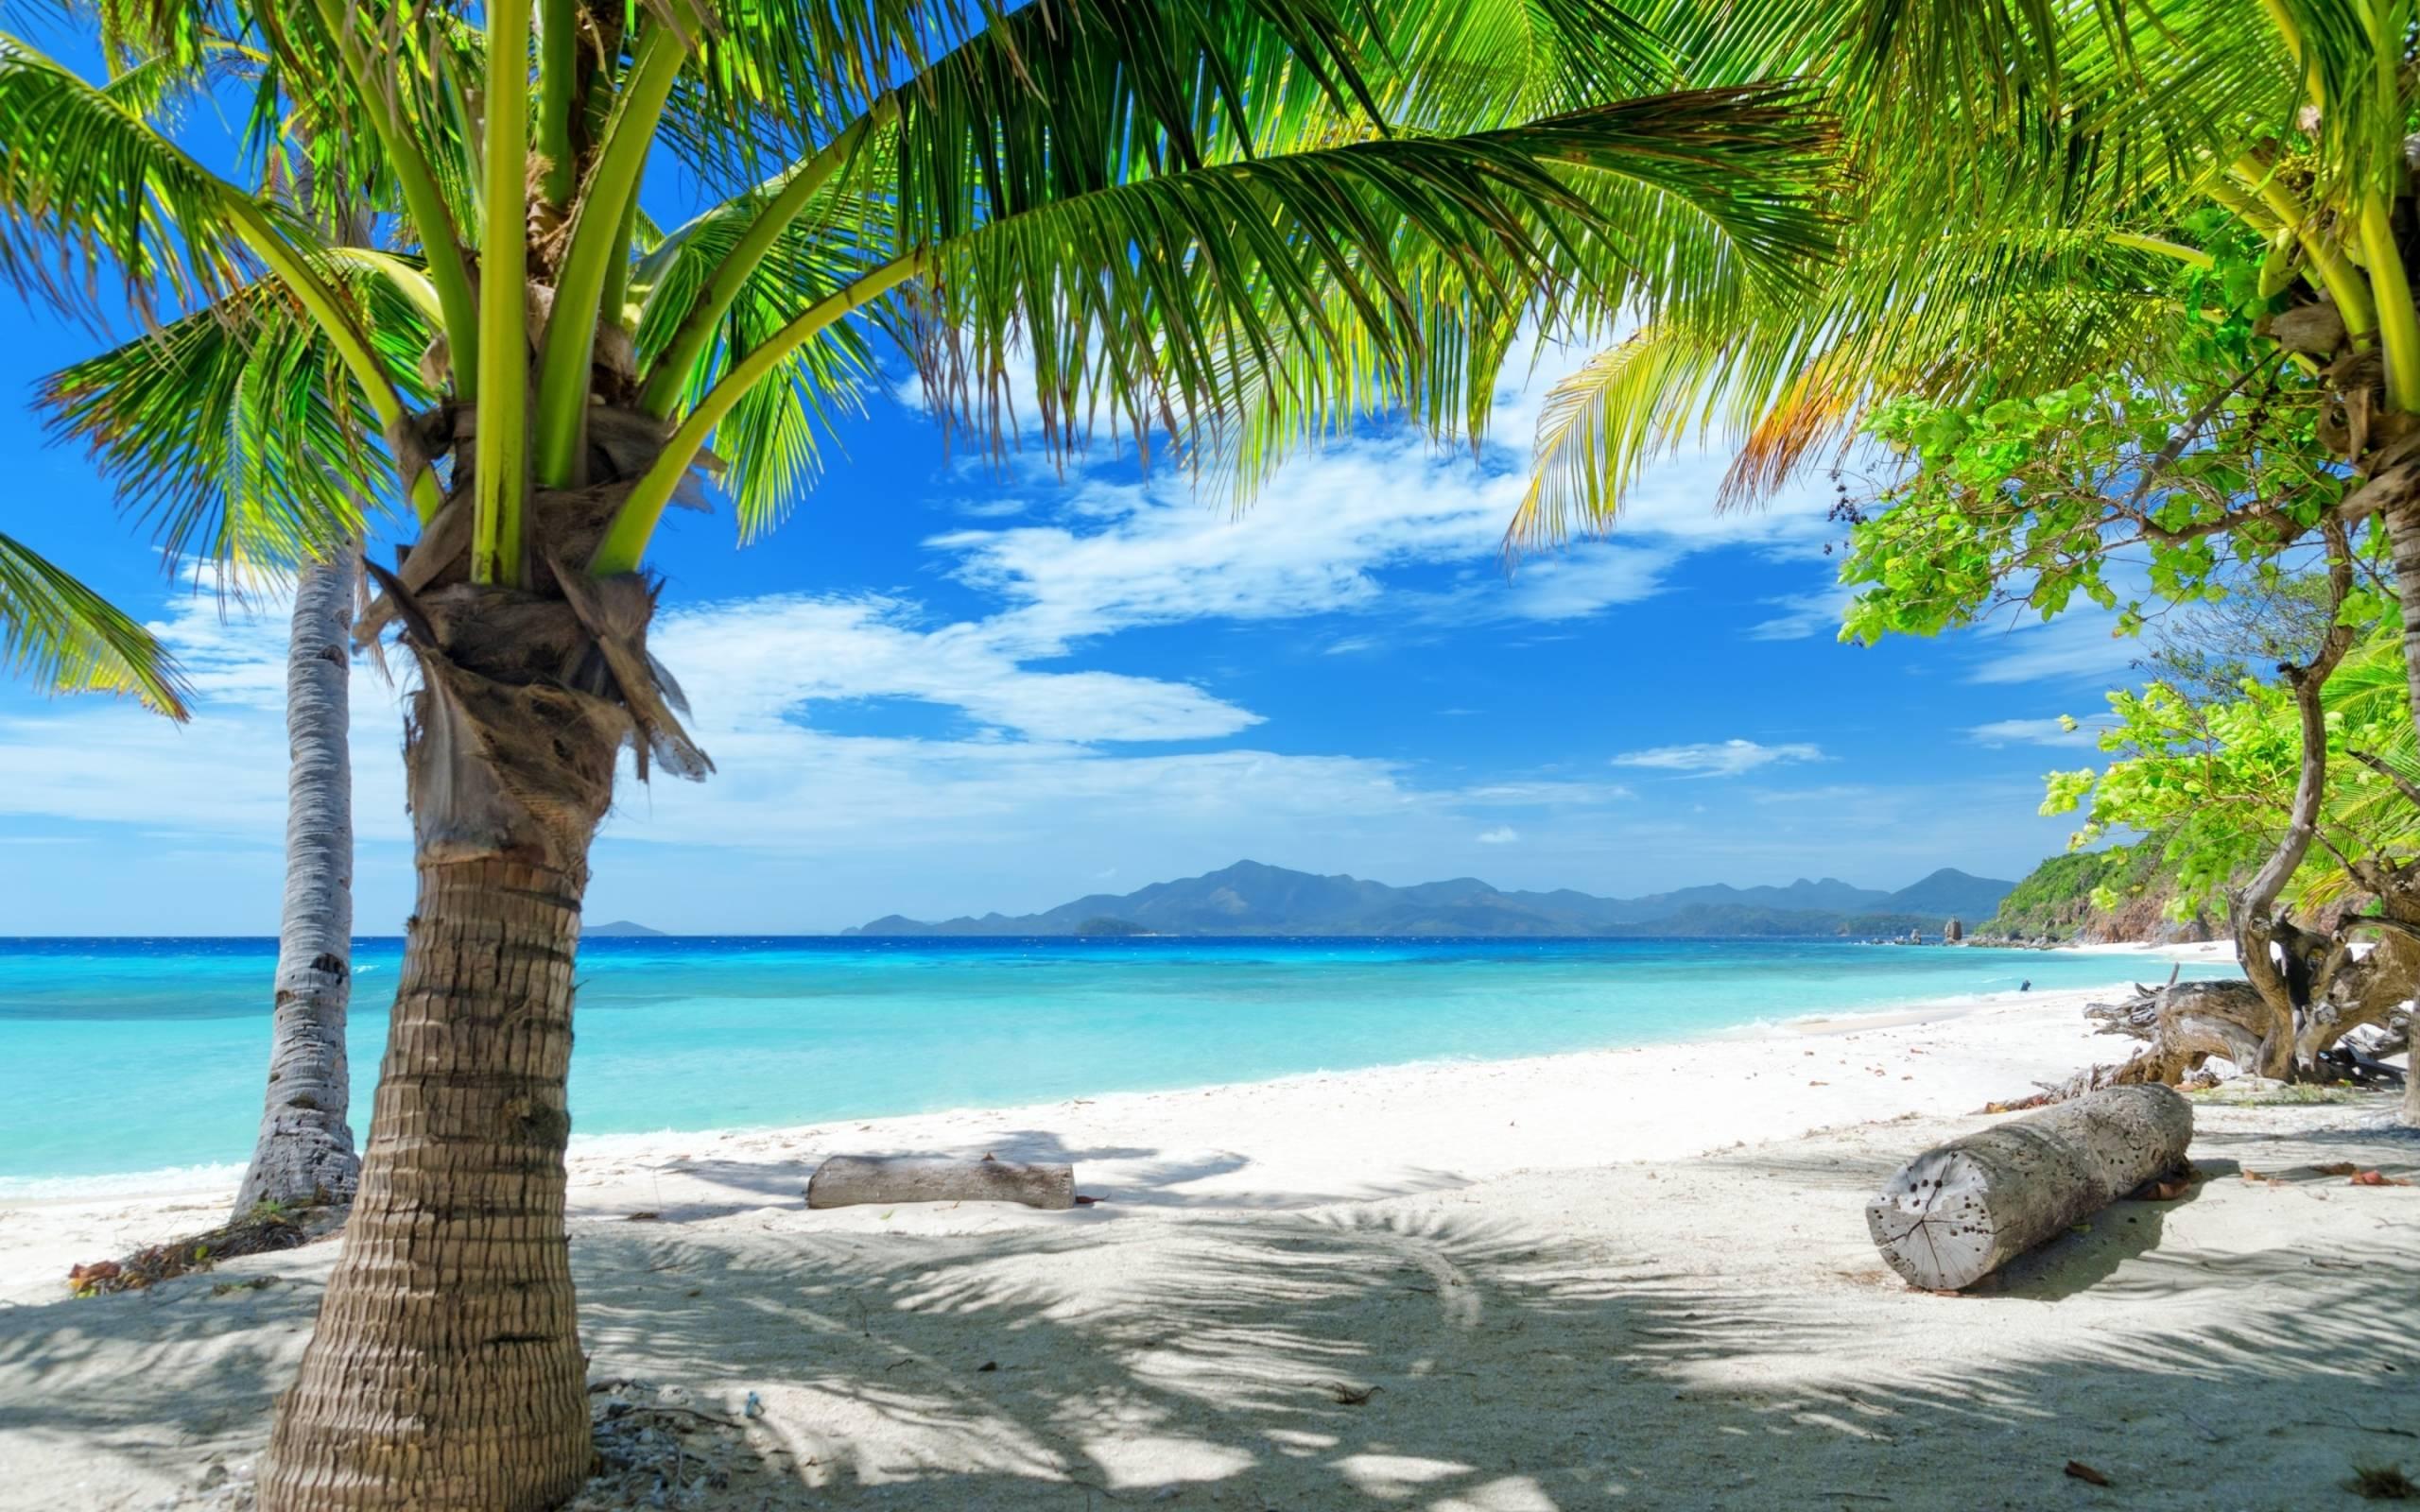 Free Desktop Wallpaper Ocean Beach